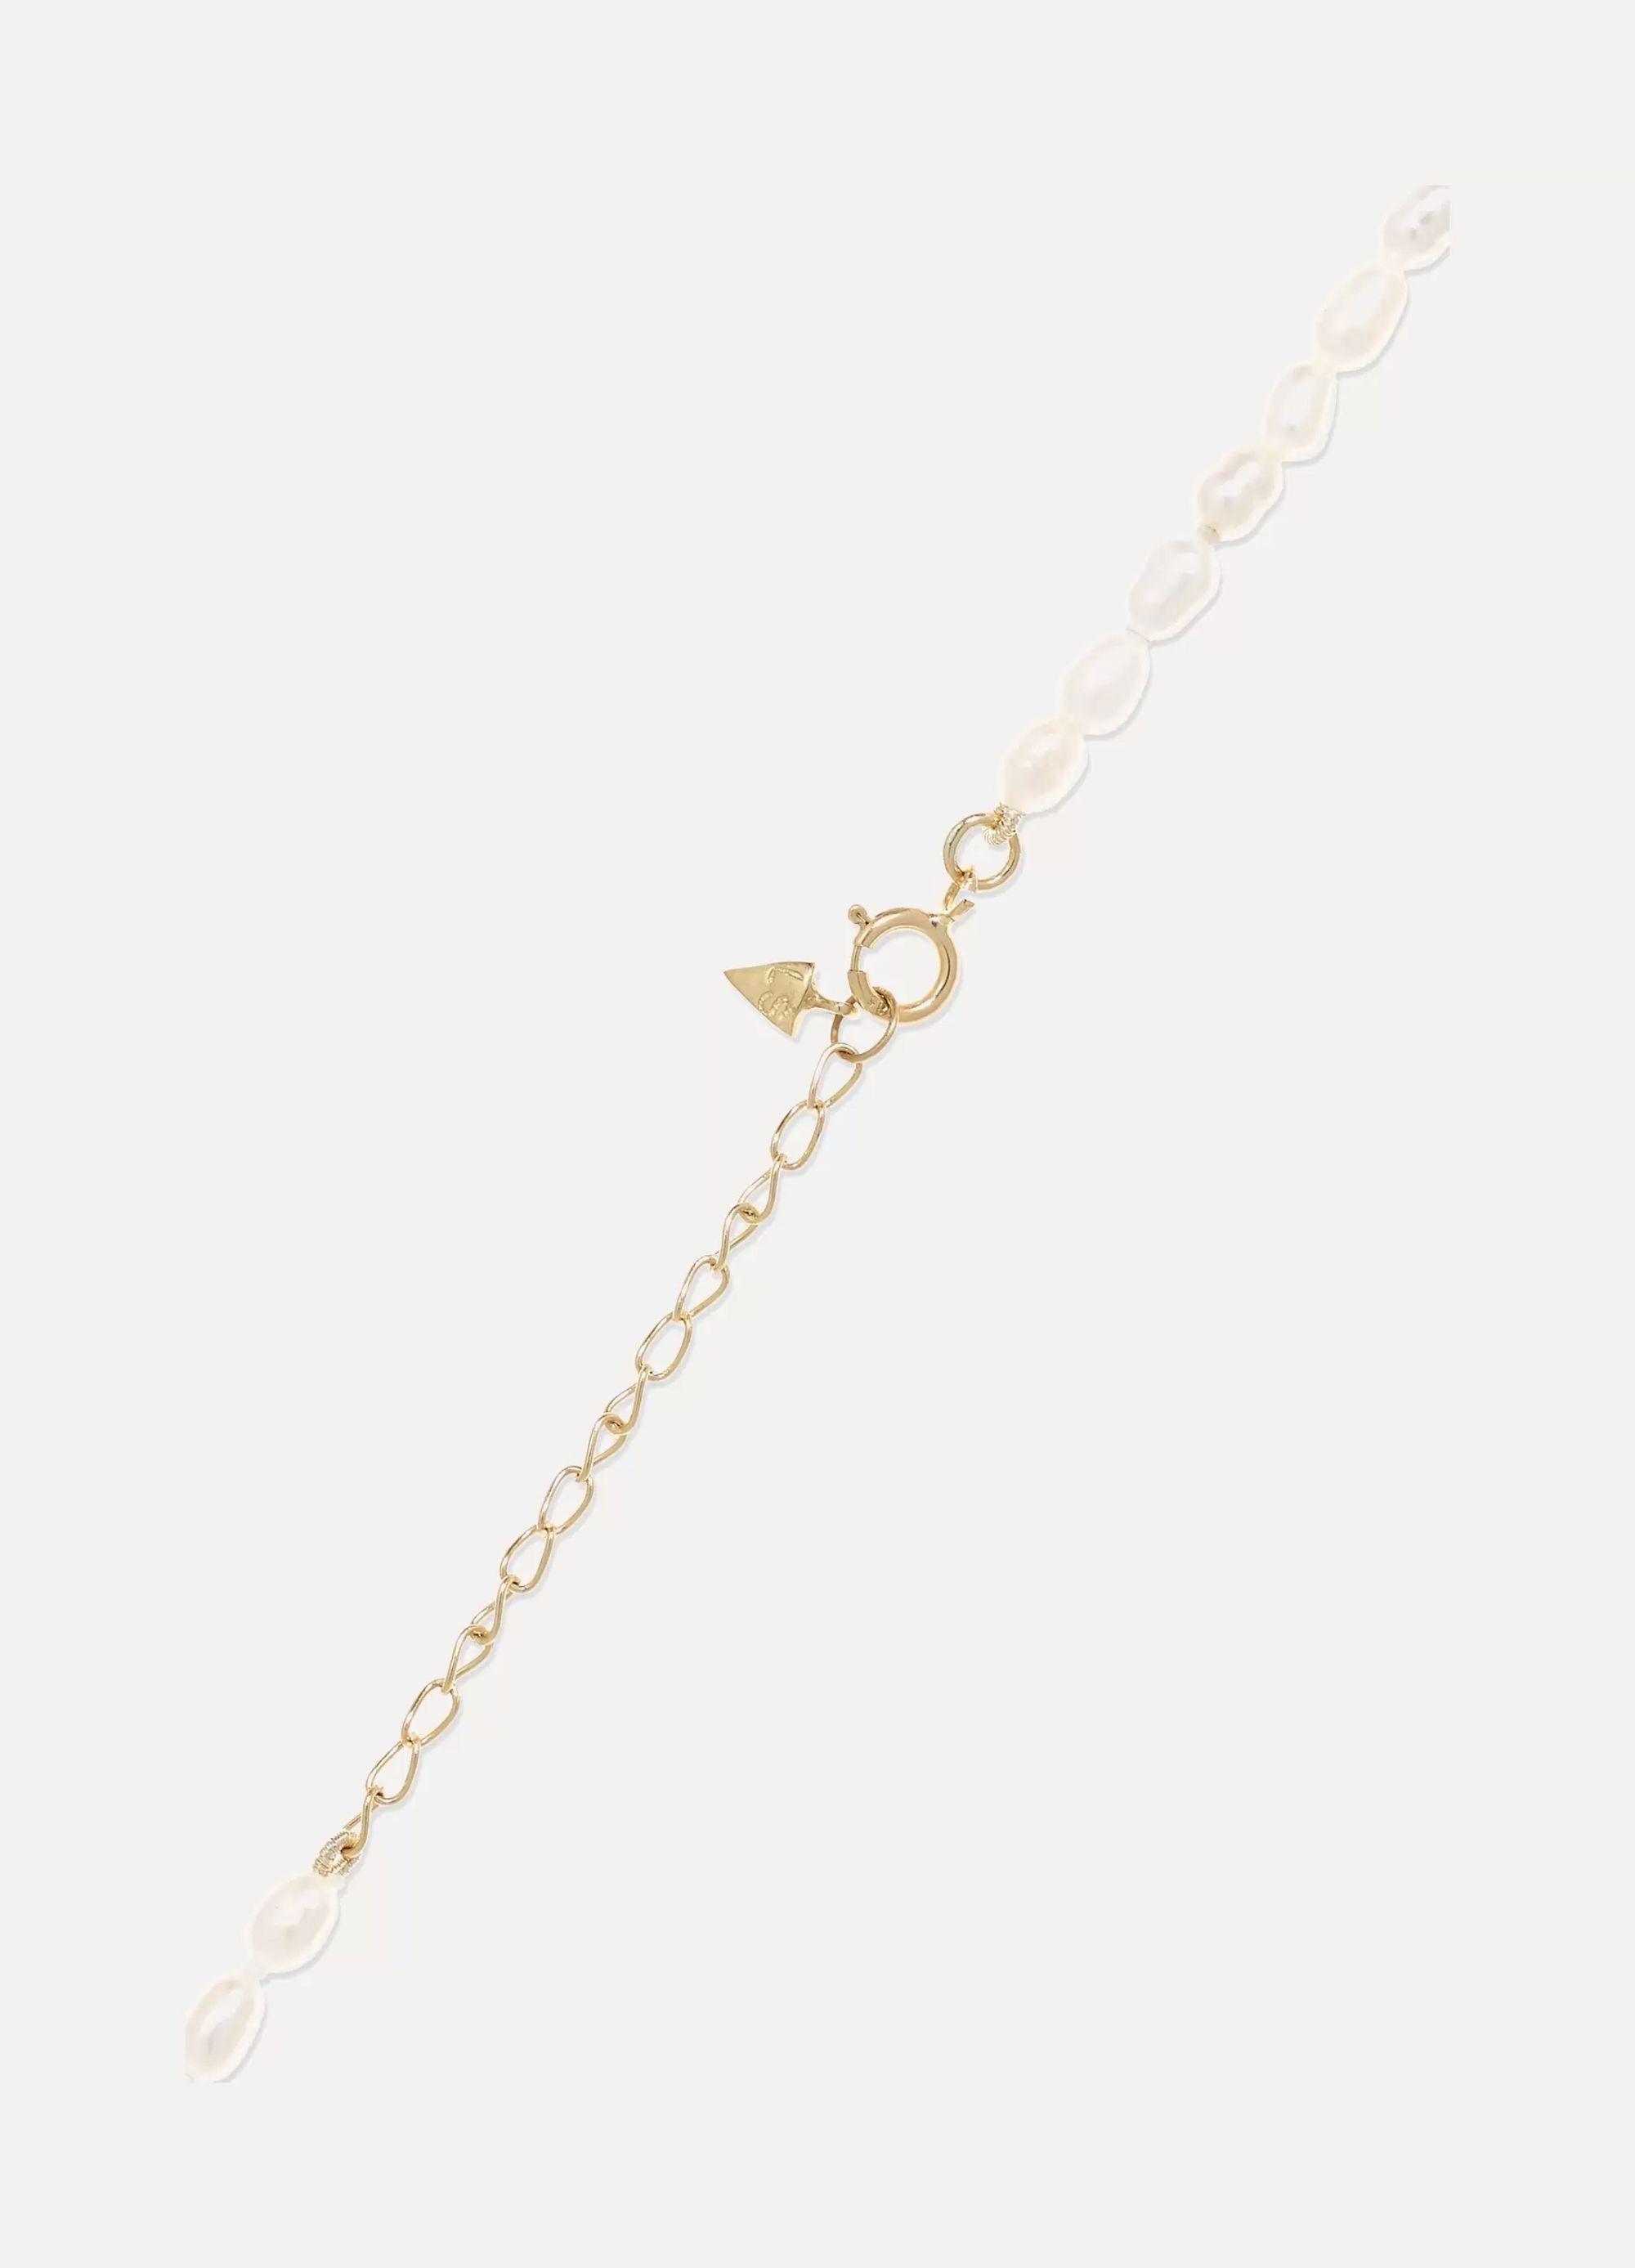 Loren Stewart La Dolce Vita gold pearl anklet